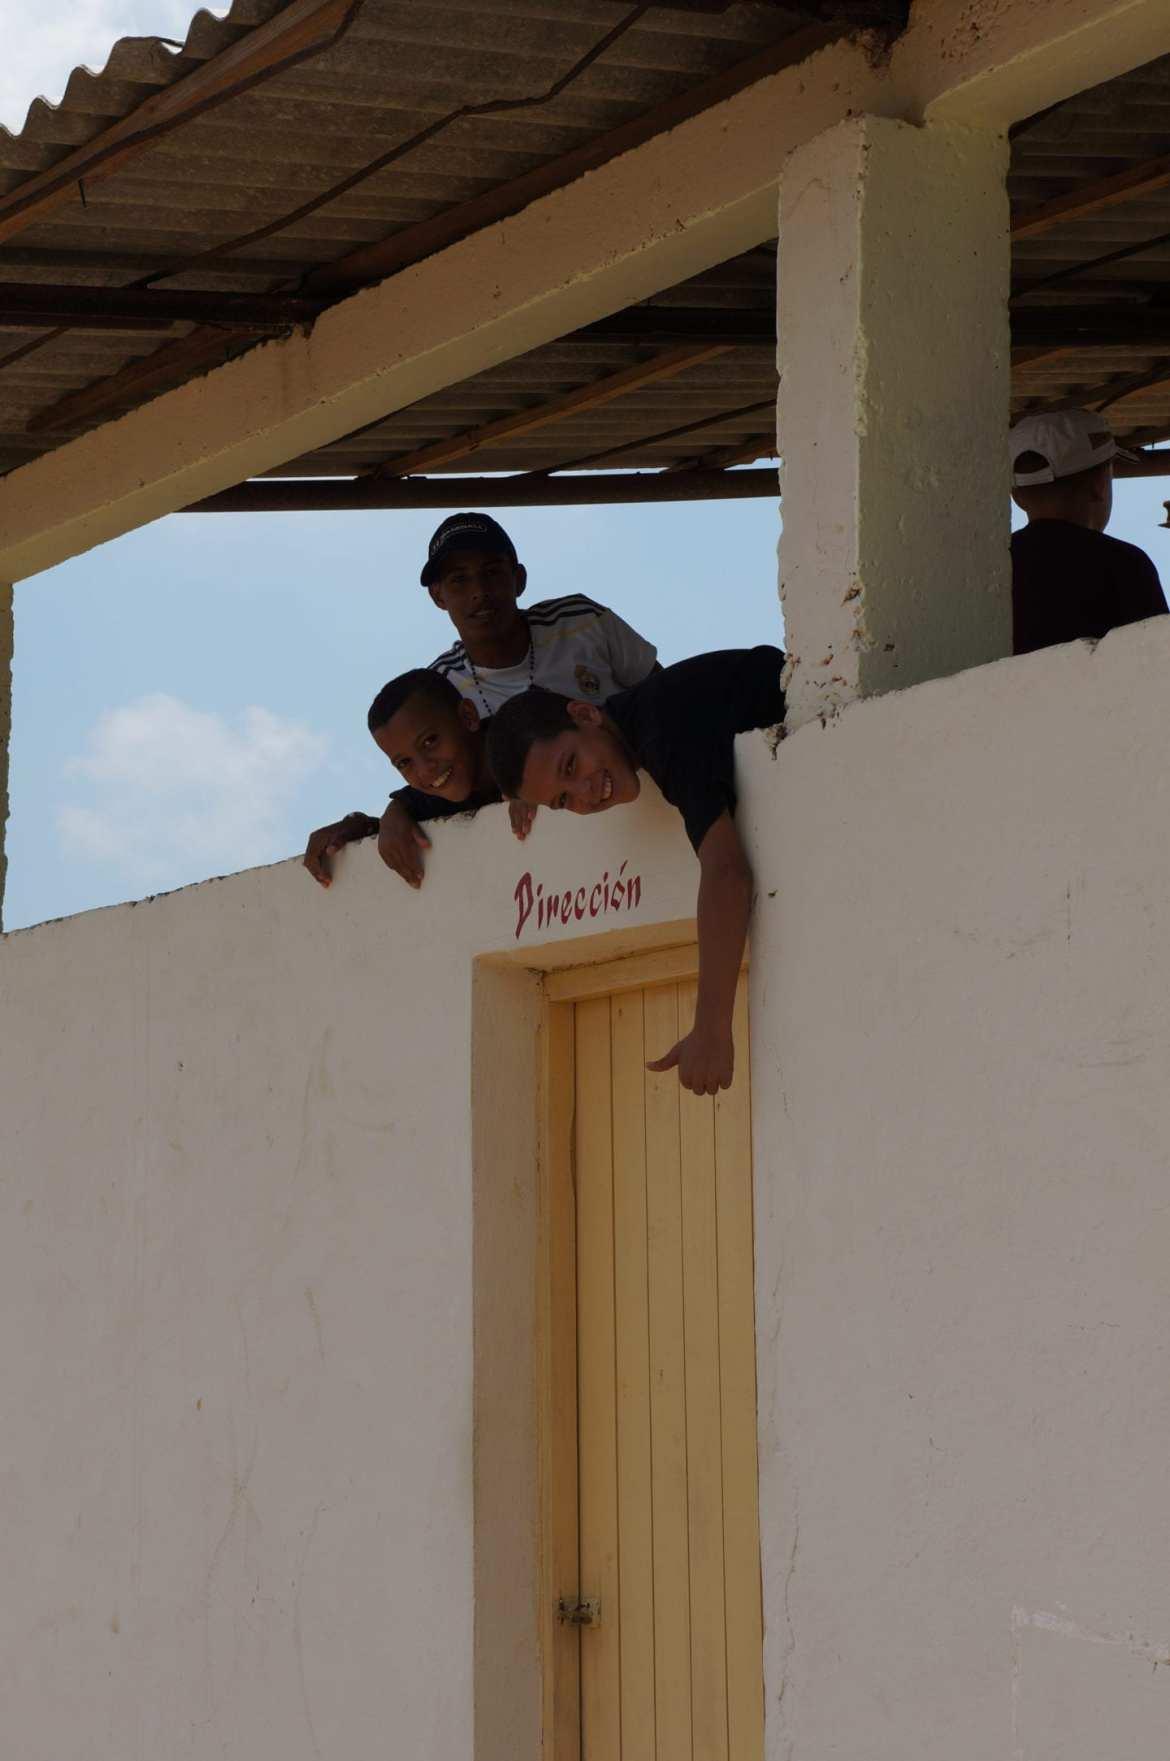 baseball fans posing at the stadium in vinales, cuba